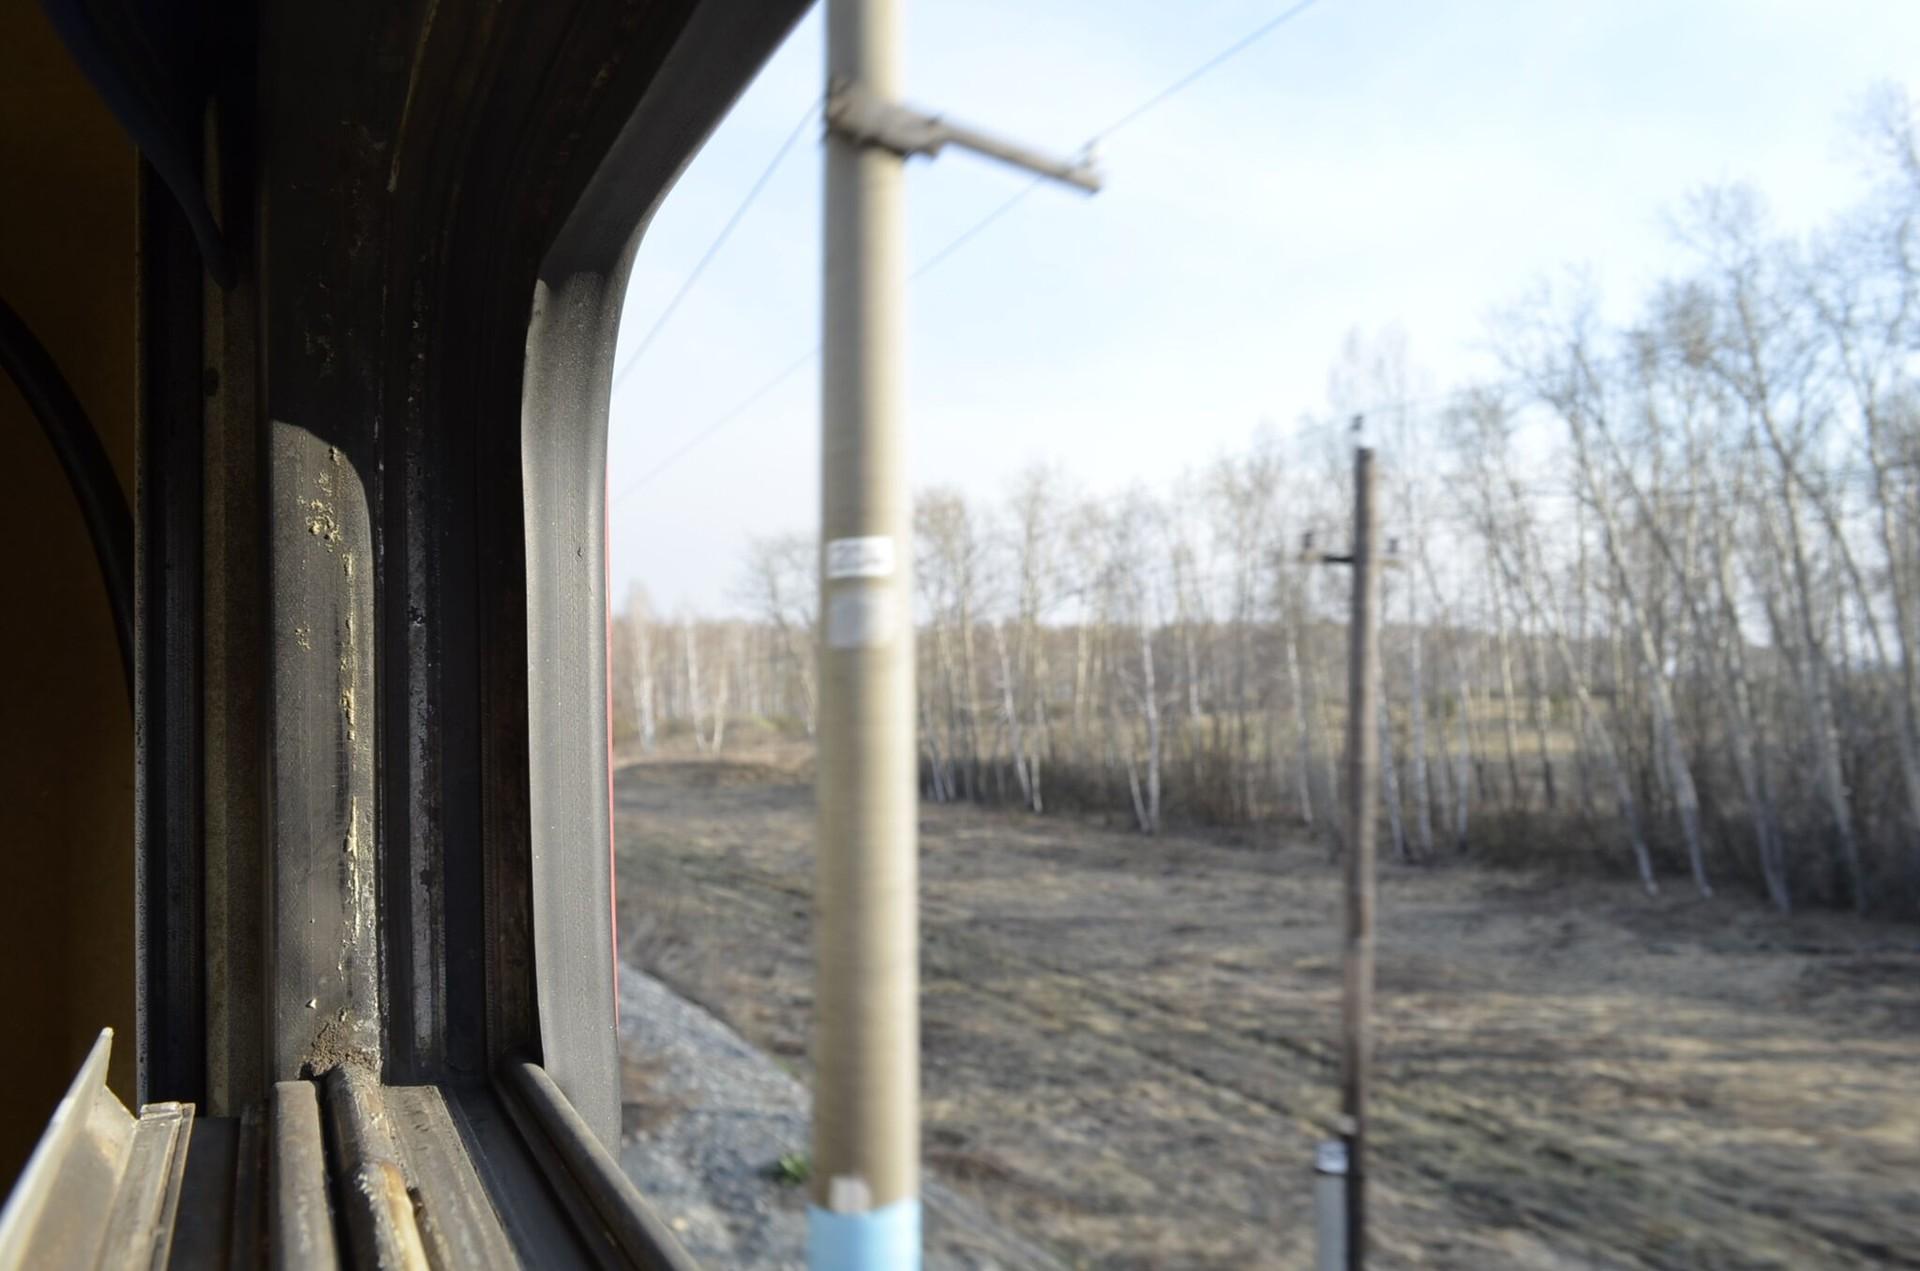 Kereta melaju dan dunia berlalu .... Semakin ke timur Anda pergi, semakin tinggi pohon-pohon birch menghadang pemandangan.